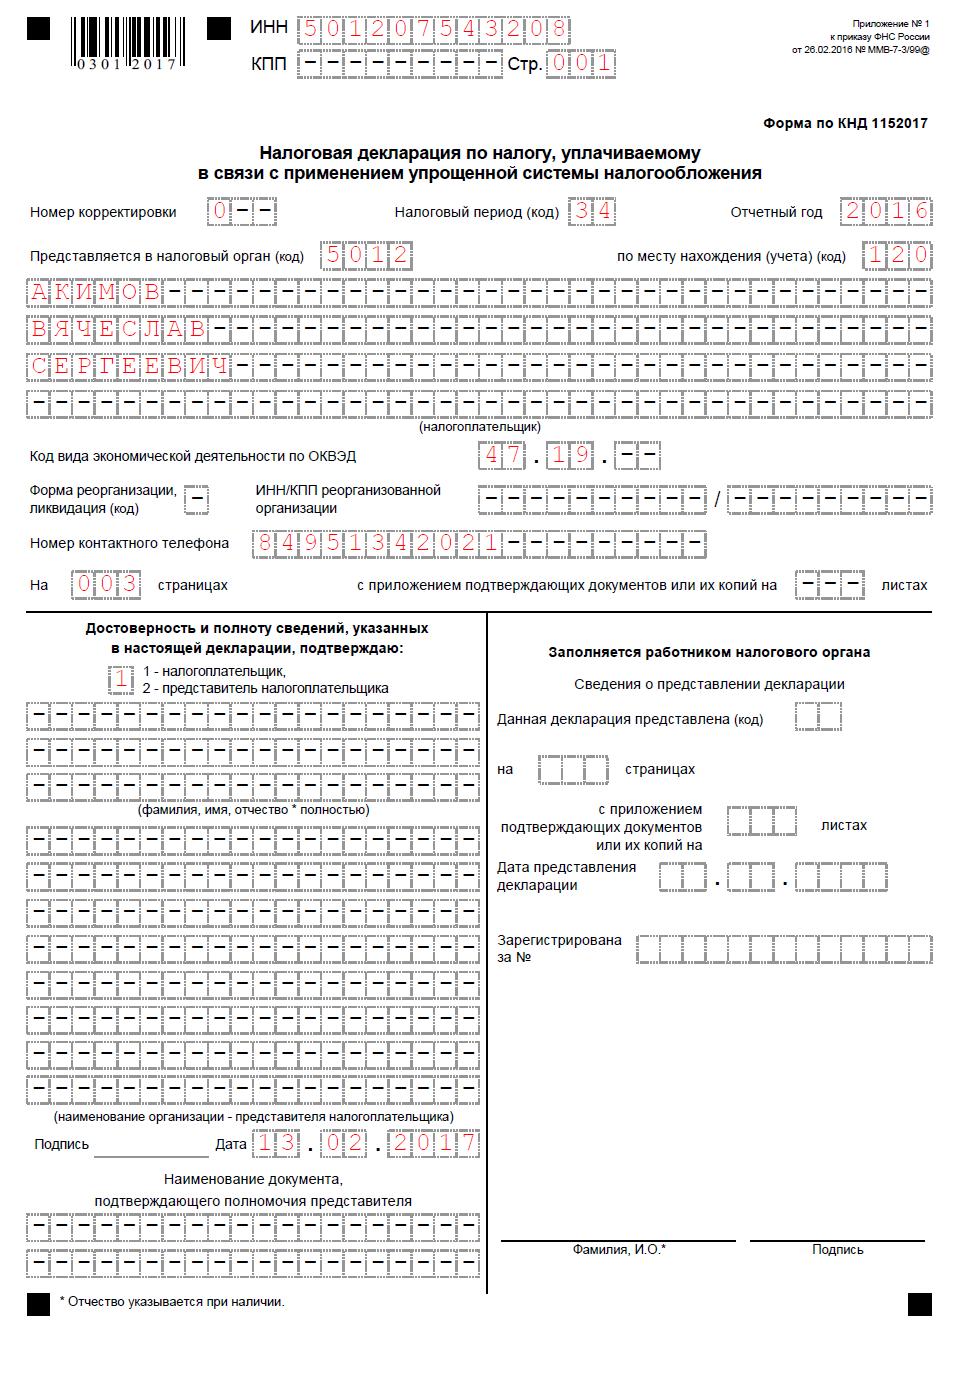 налоговая декларация по усн за 2015 год cj inhb rjljv бланк